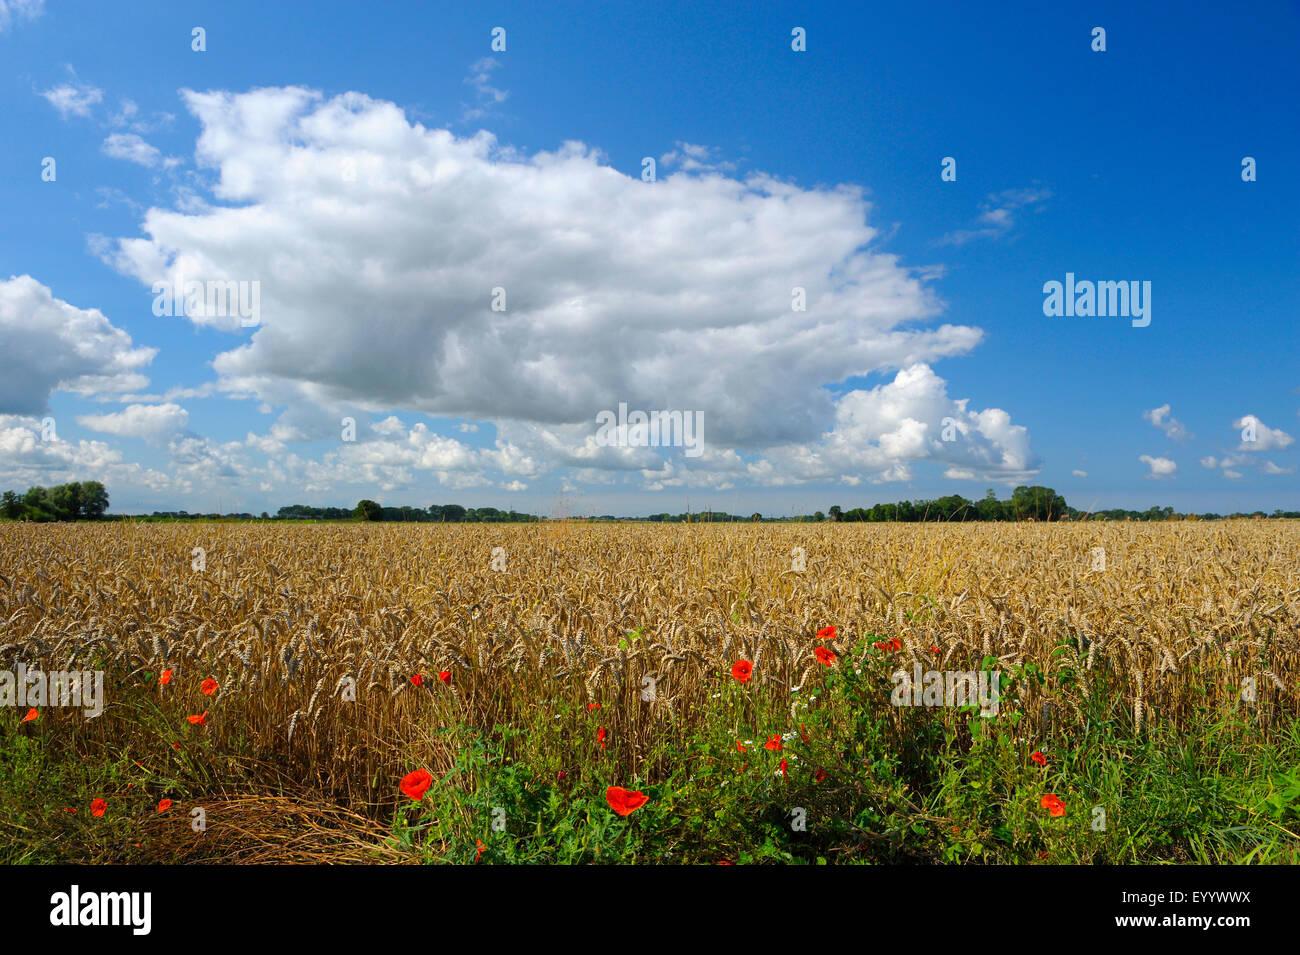 ripe wheat field in summer, Germany, Lower Saxony, Otterndorf - Stock Image